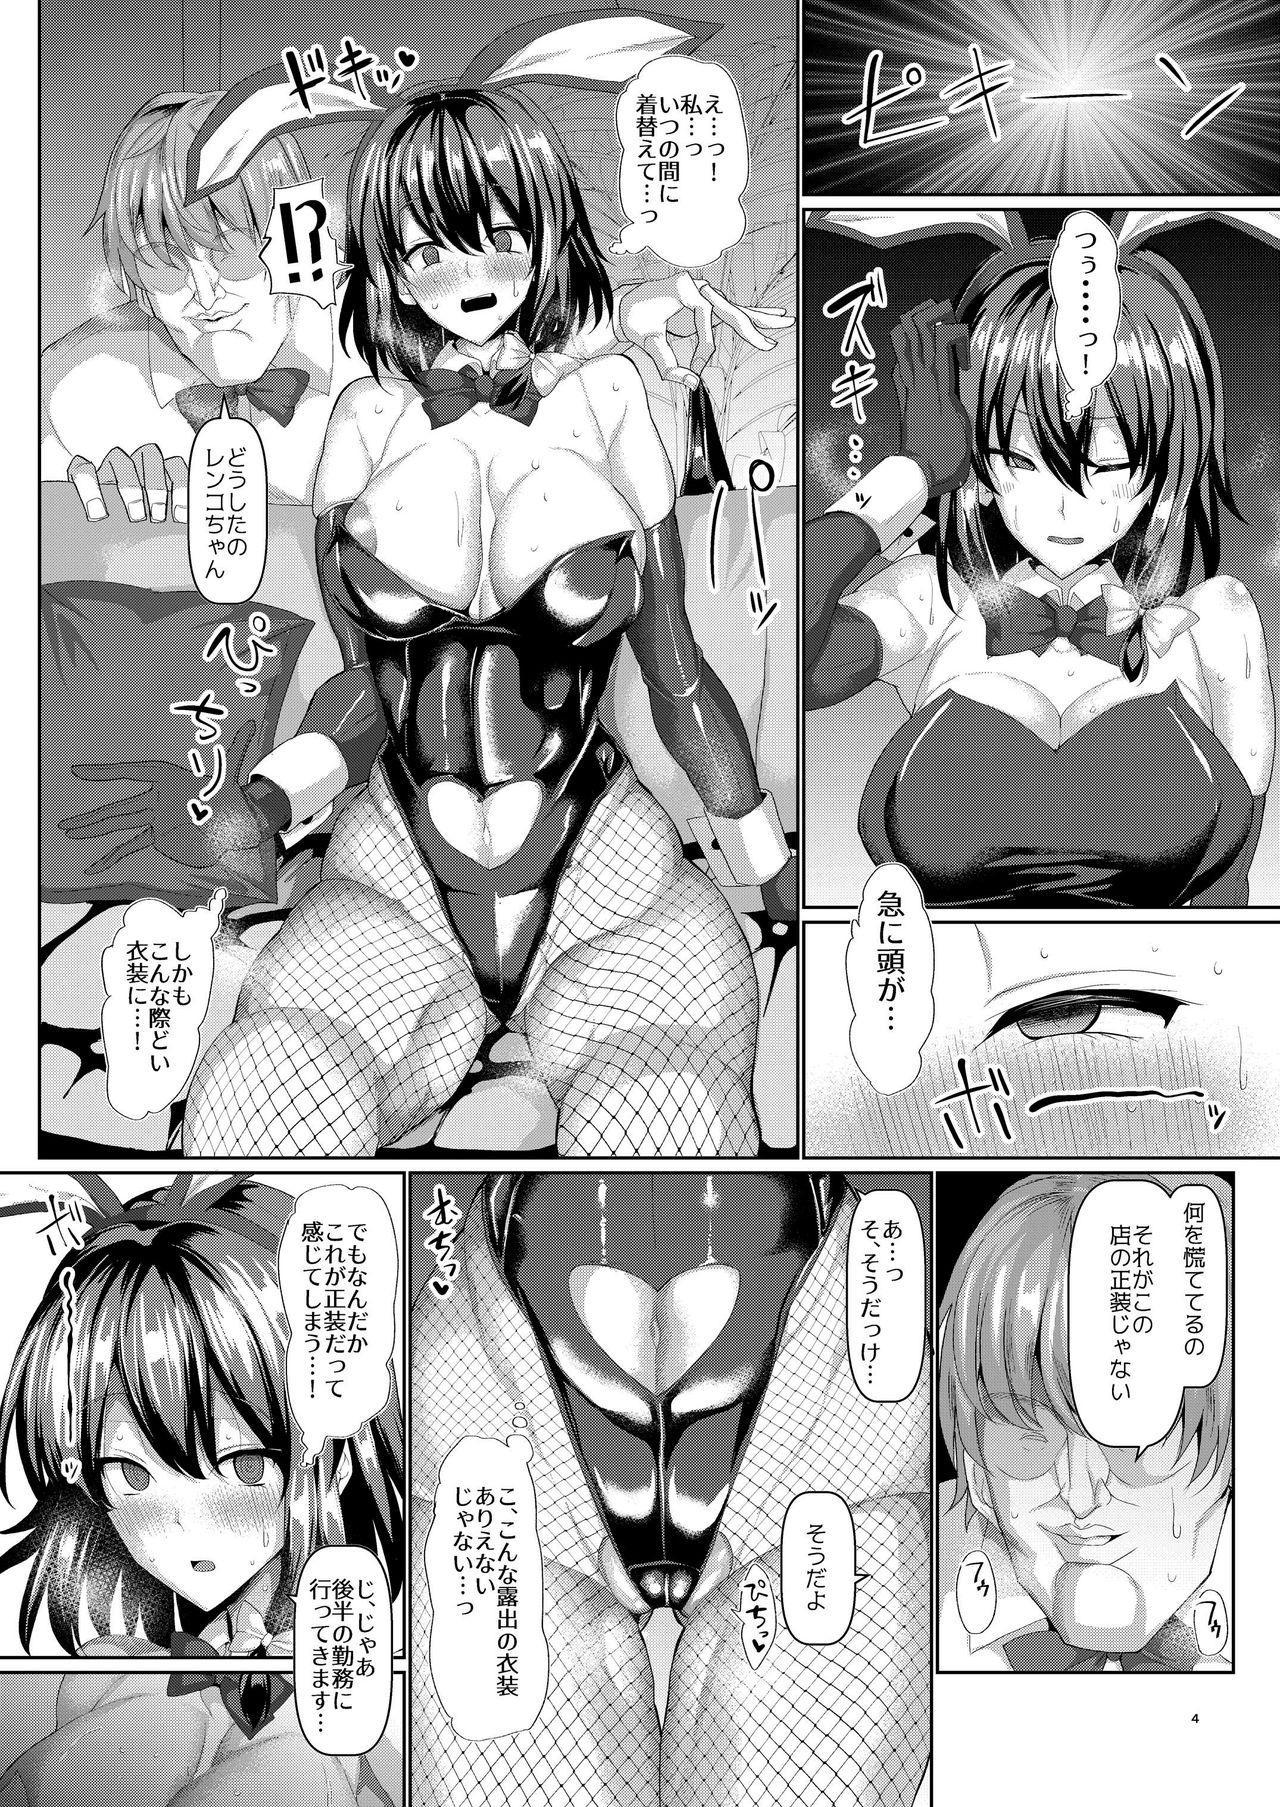 Renko Sennyuu! Saimin Bunny Girl 5